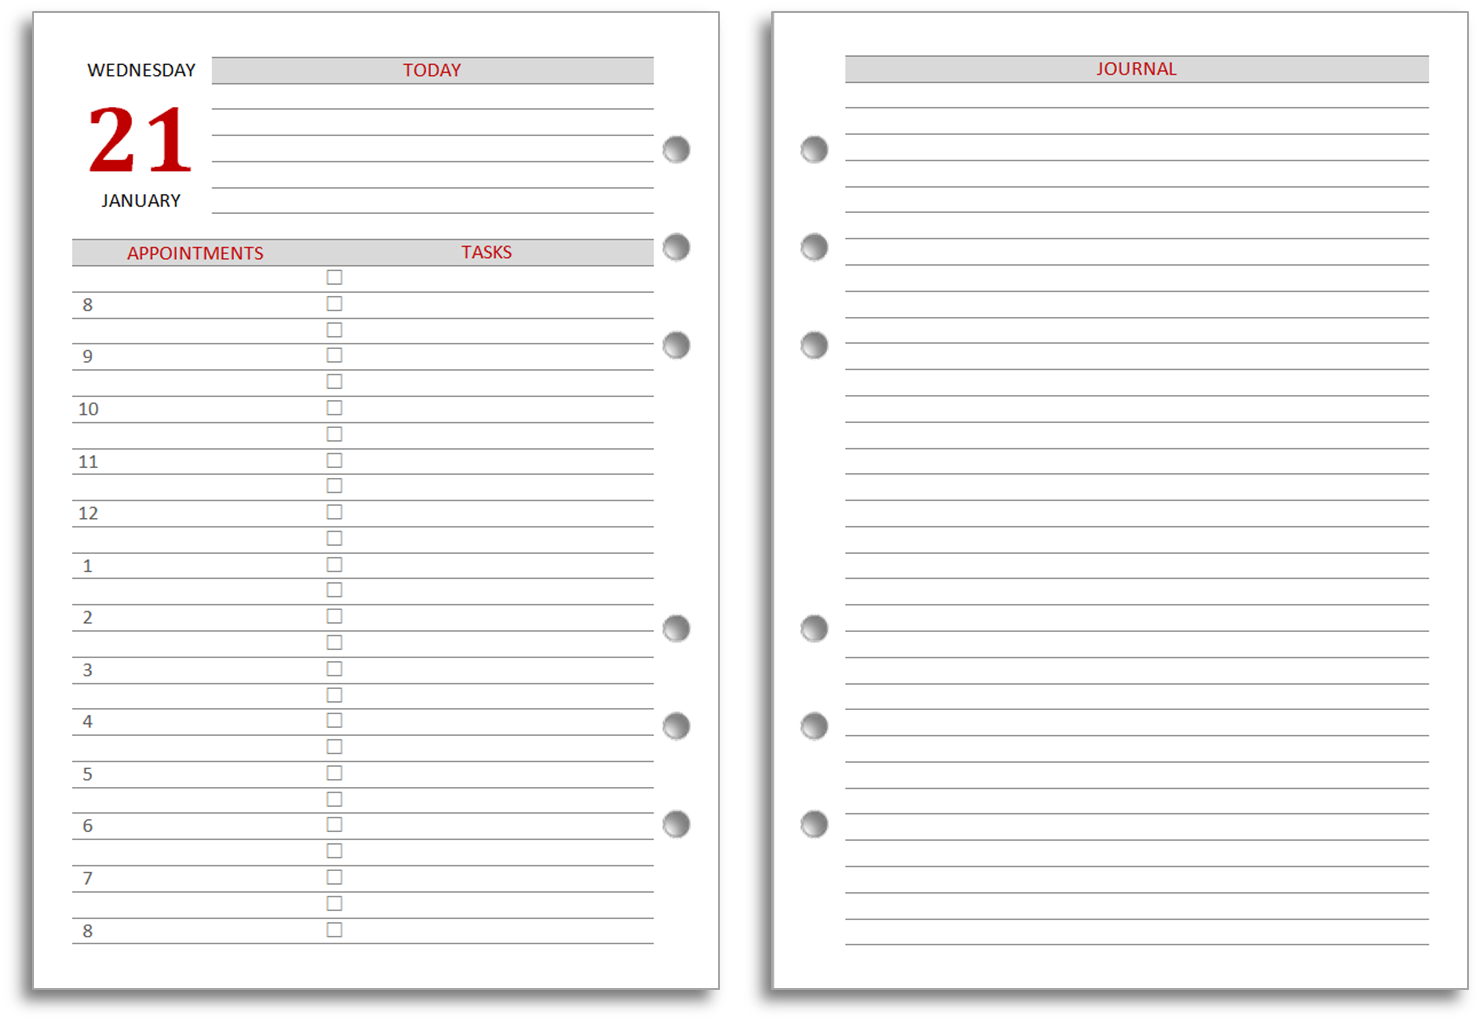 2016 Daily Calendar Printable | Search Results | Calendar 2015